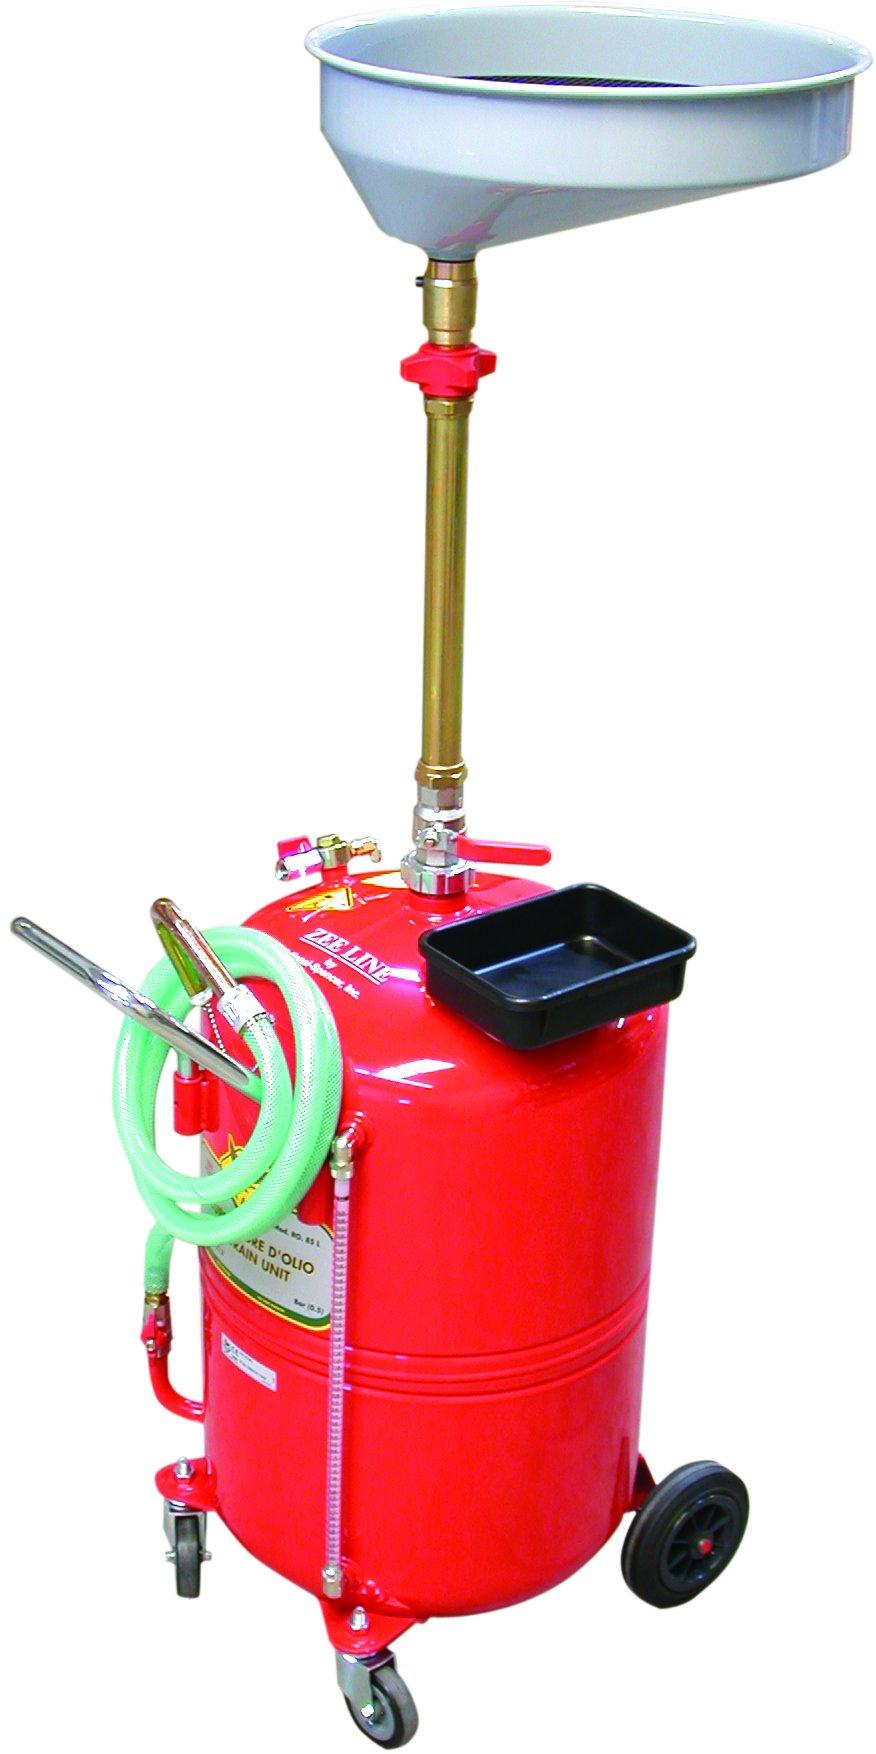 National-Spencer 1234 Economy Waste Oil Drainer, 21 gal